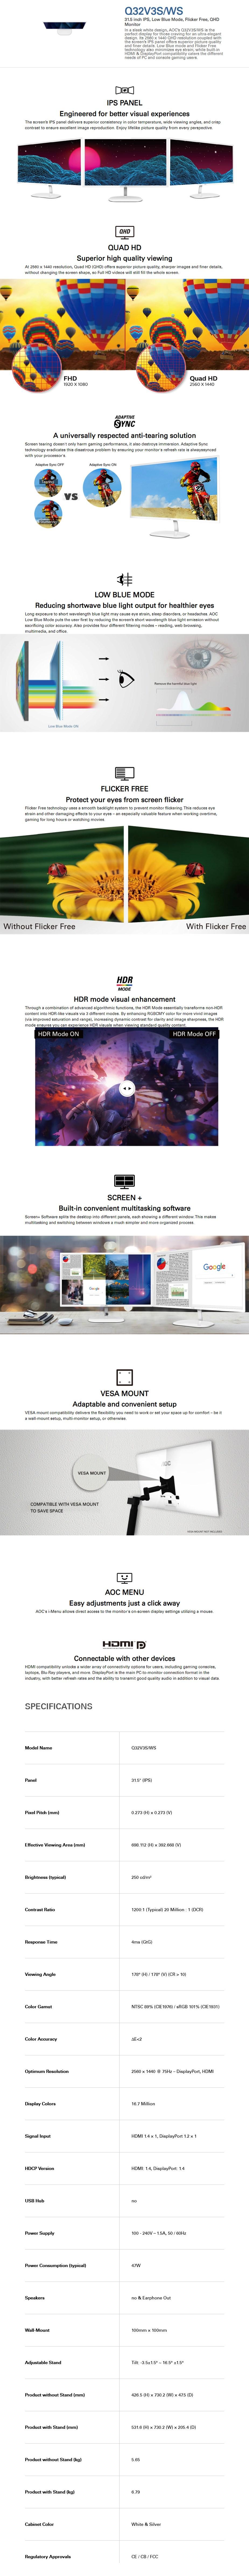 "AOC Q32V3S/WS 31.5"" WQHD 4ms 75Hz Adaptive Sync IPS Monitor - Desktop Overview 1"